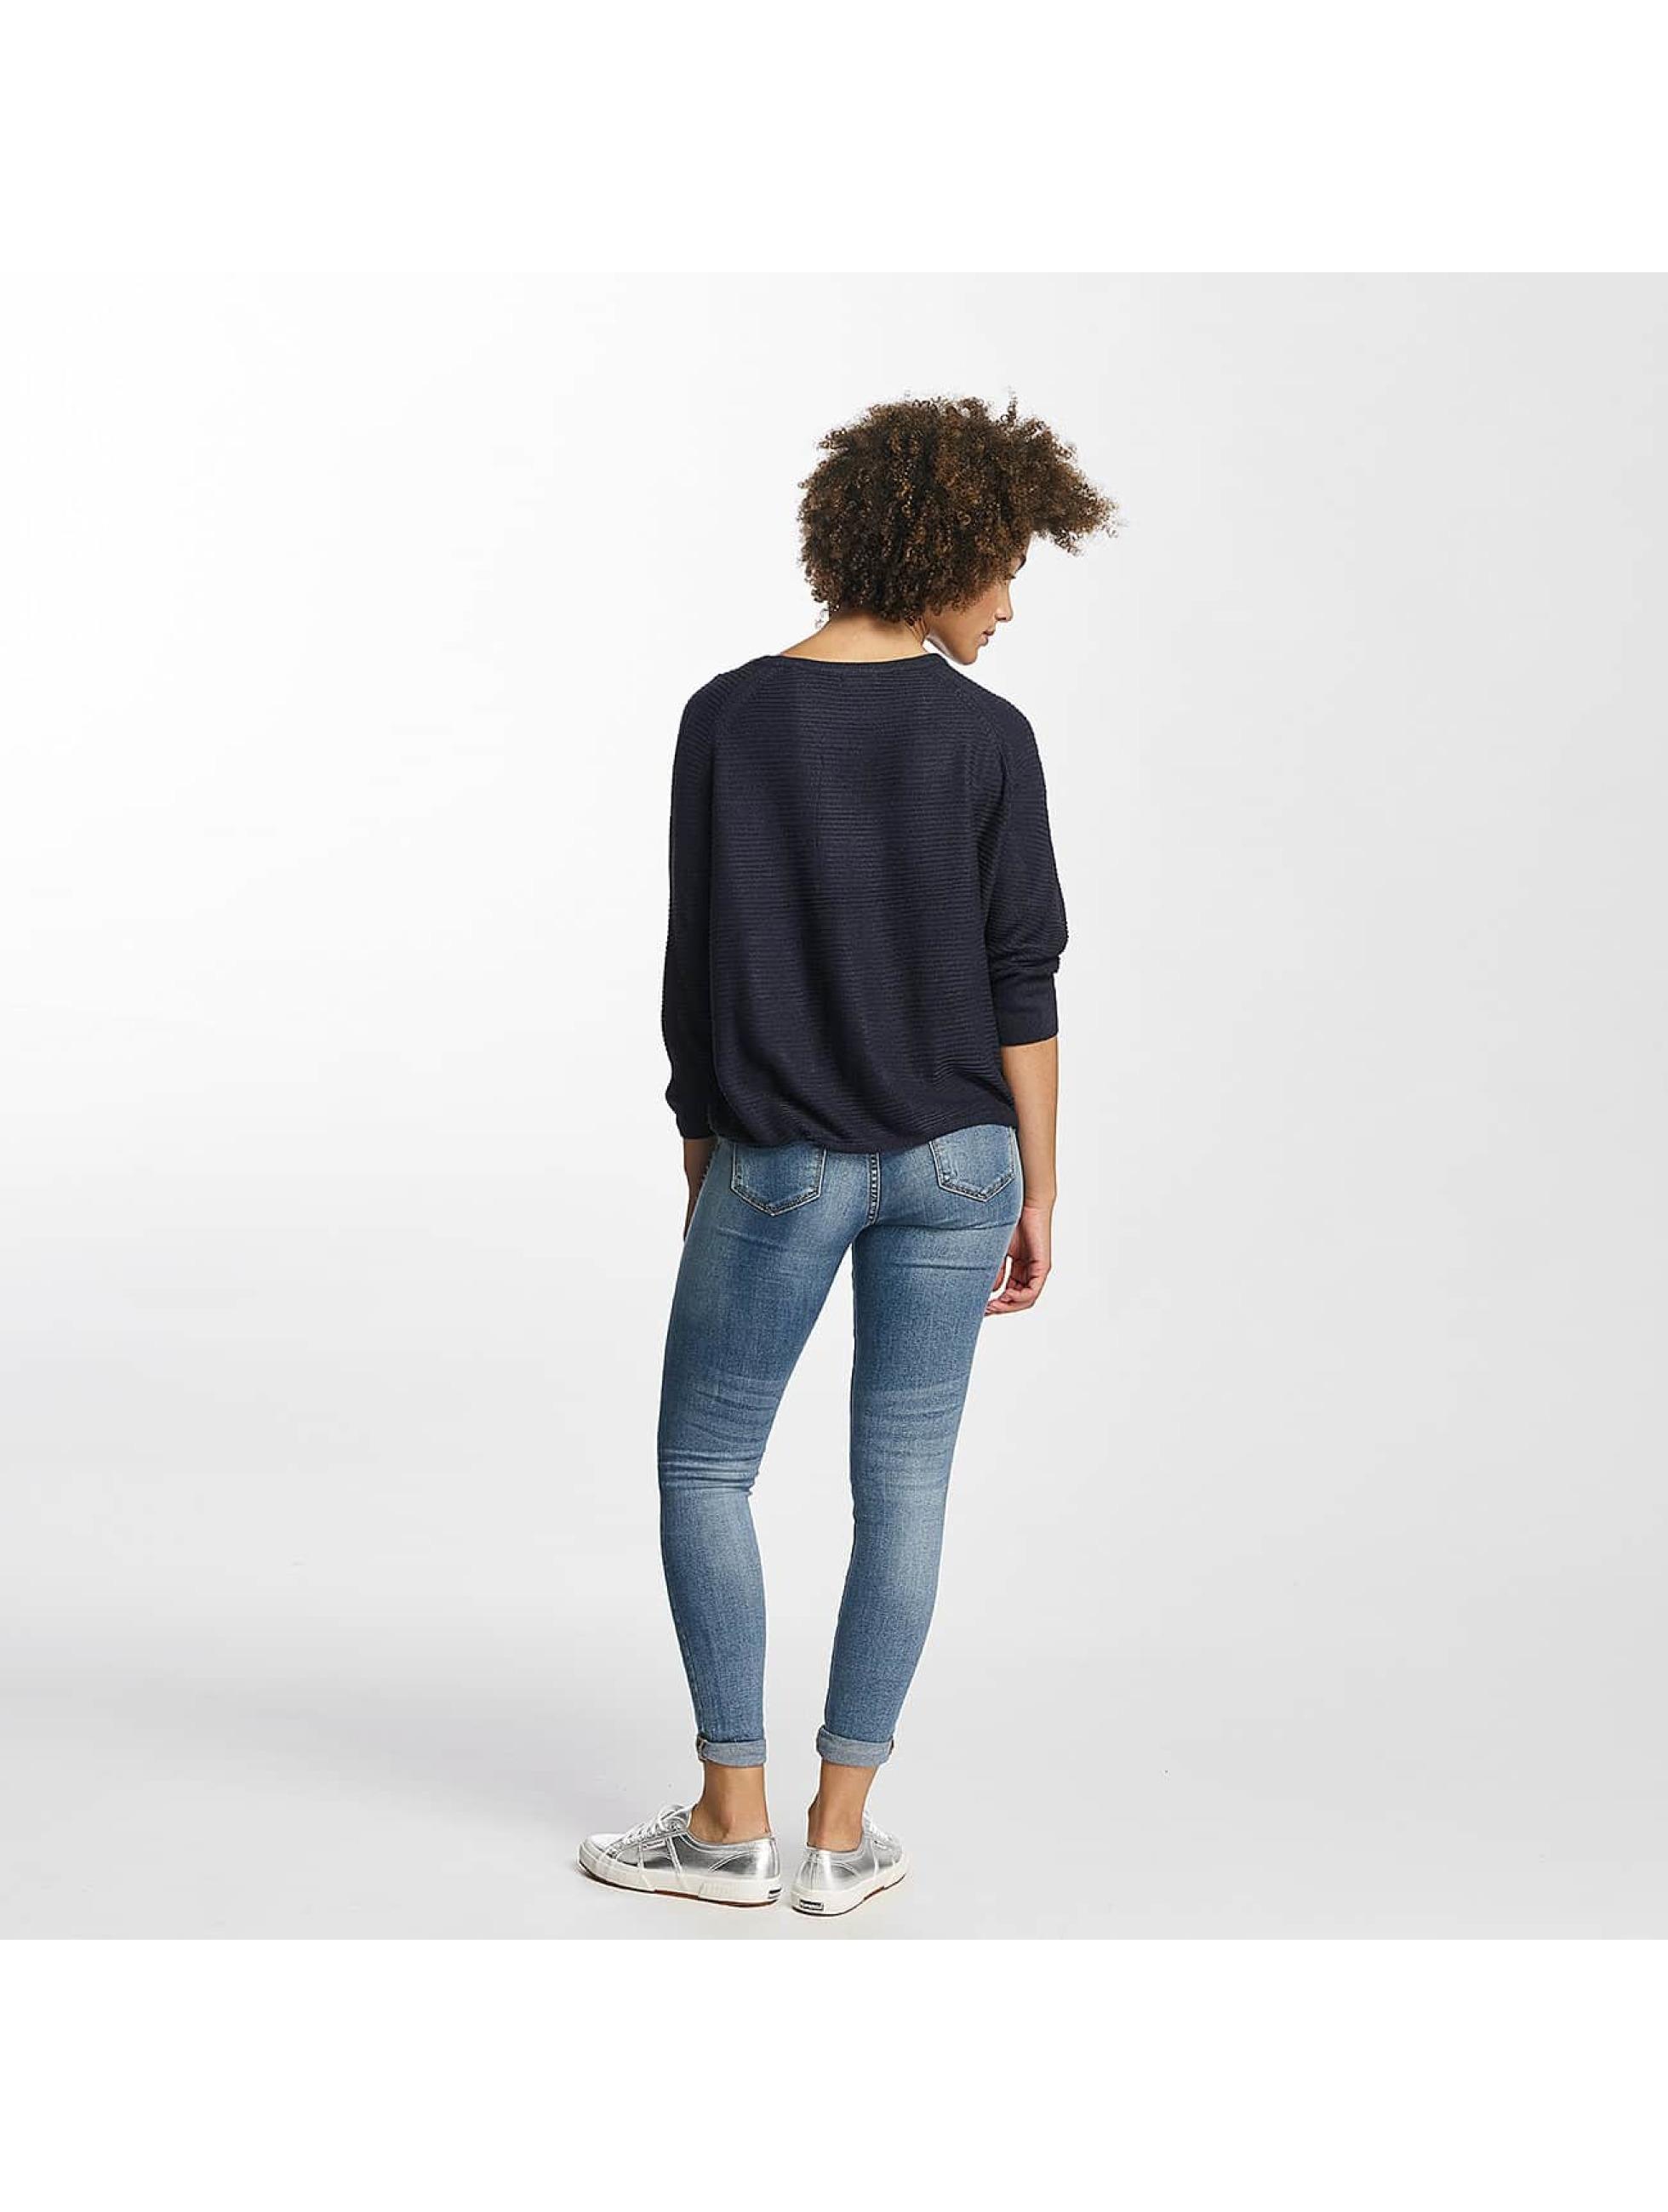 JACQUELINE de YONG Jersey jdyMati Knit azul